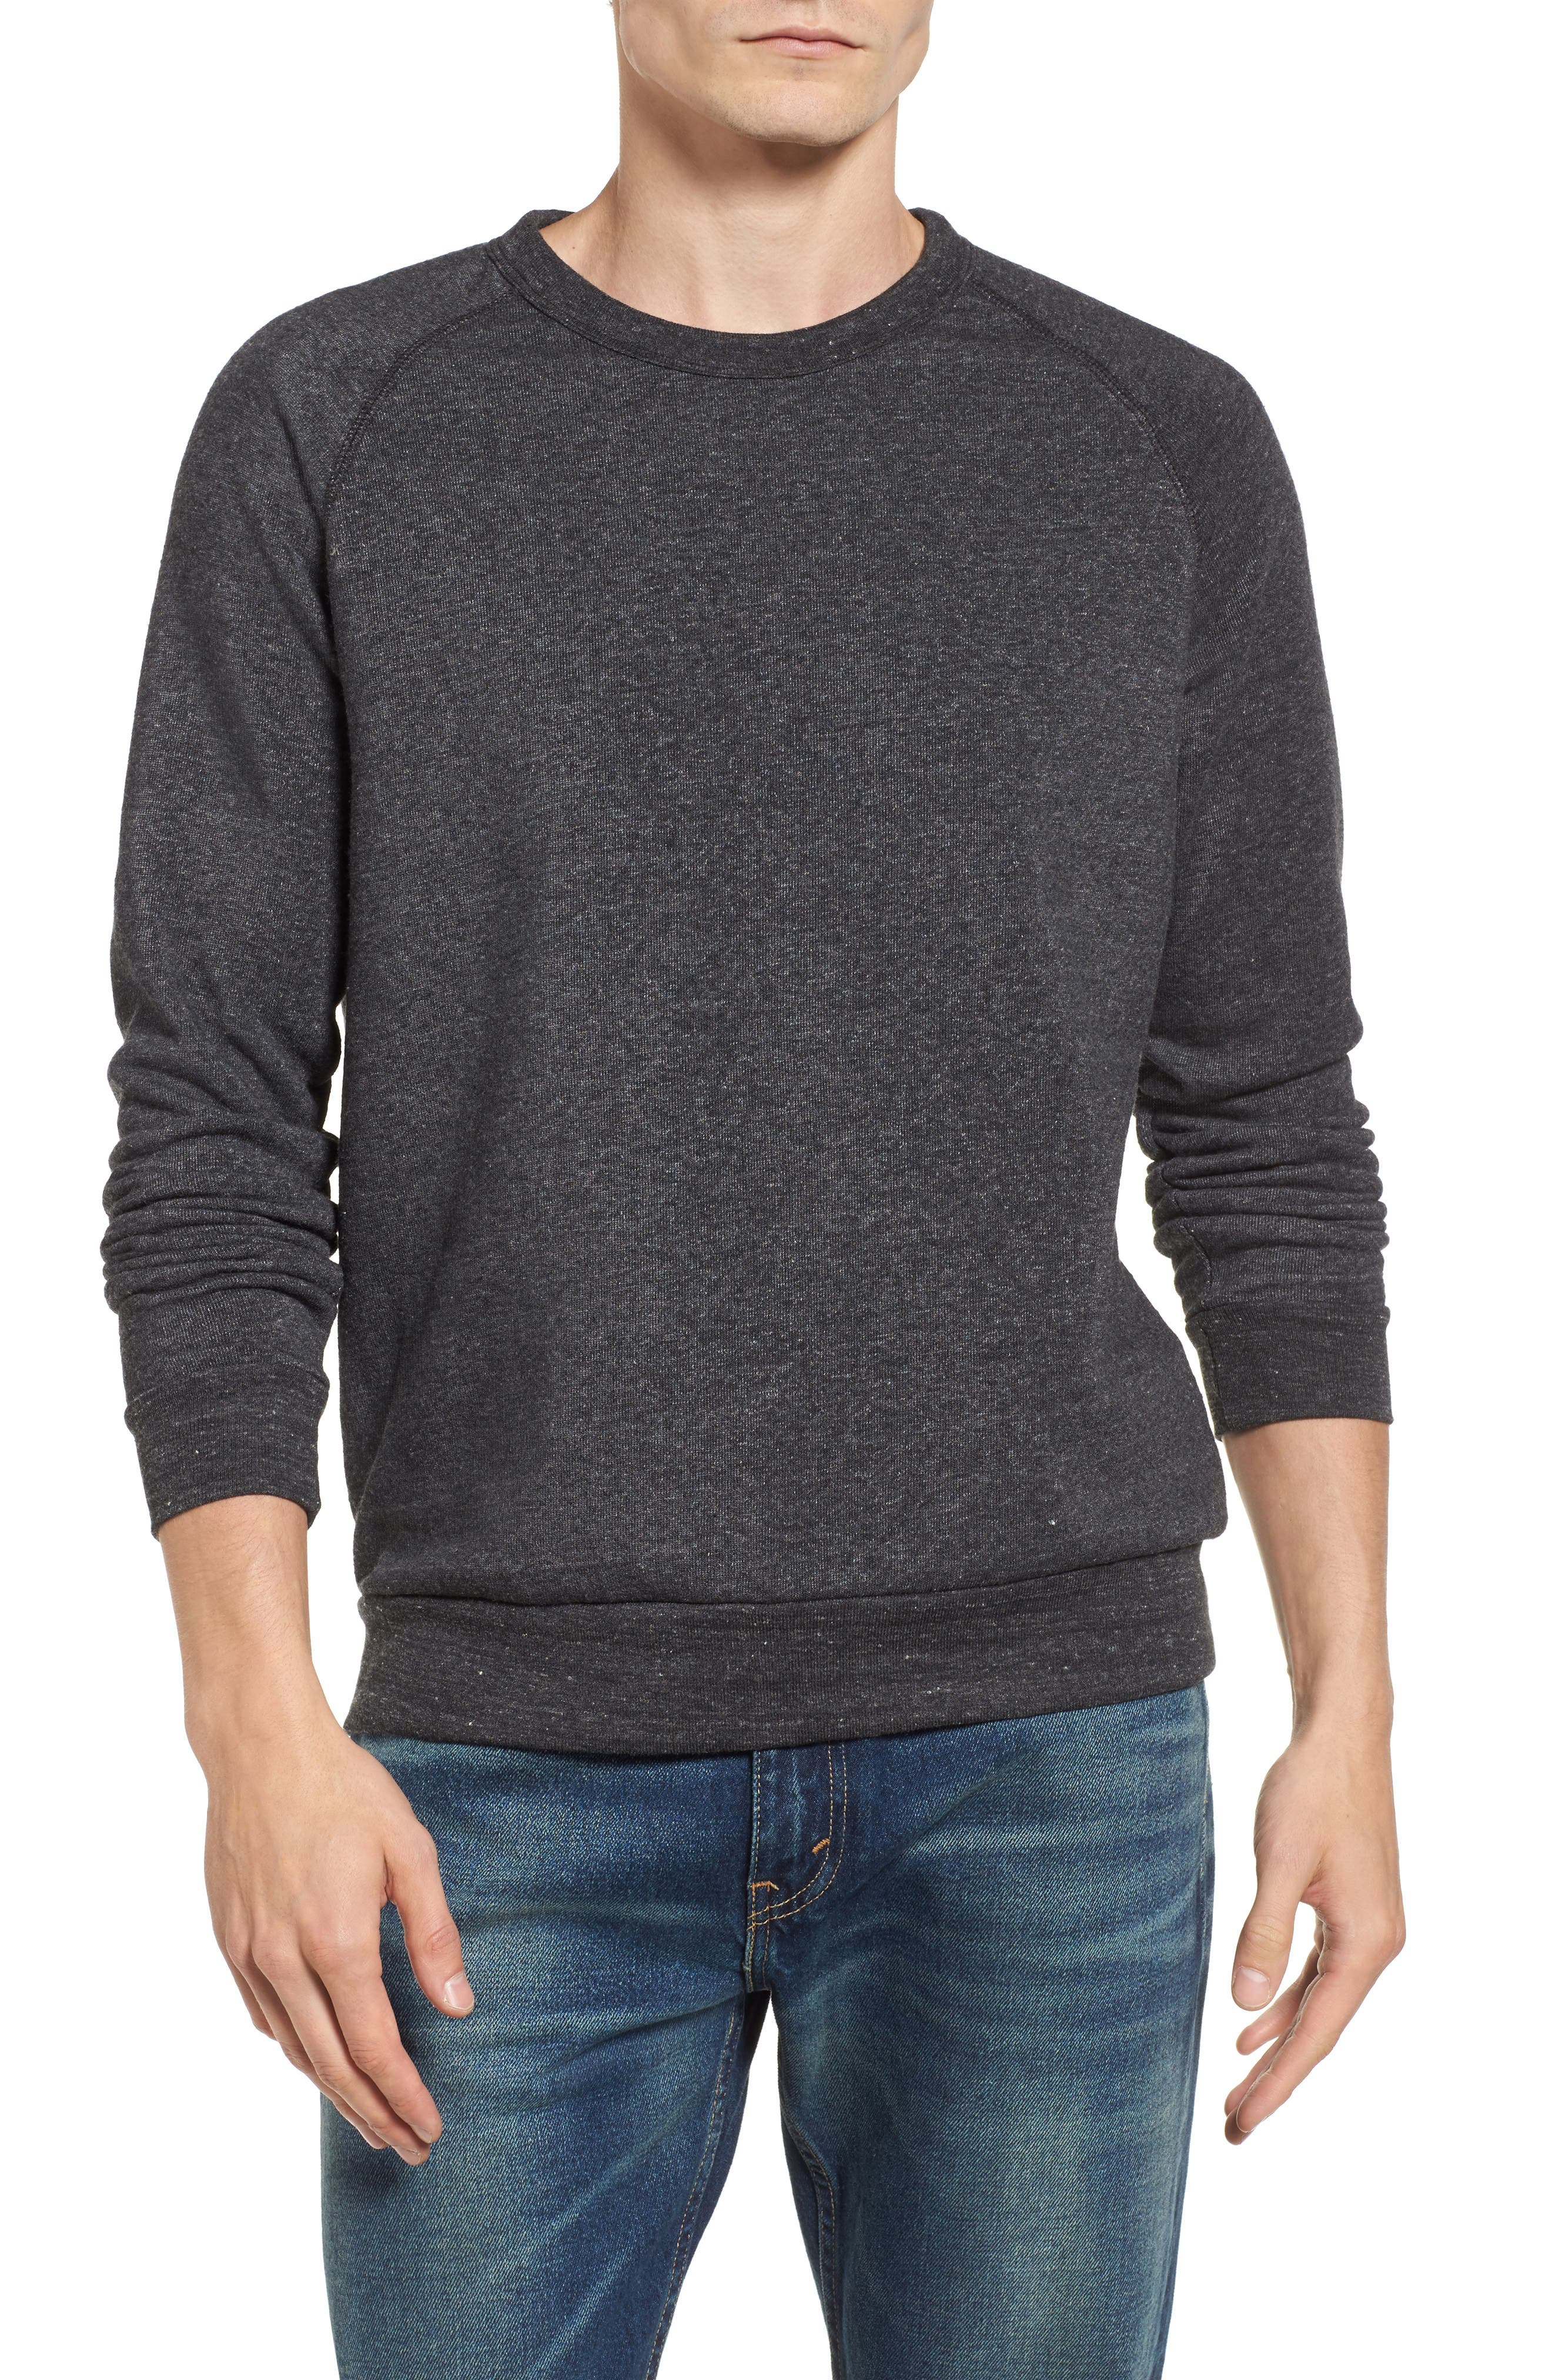 'The Champ' Sweatshirt,                         Main,                         color, 010